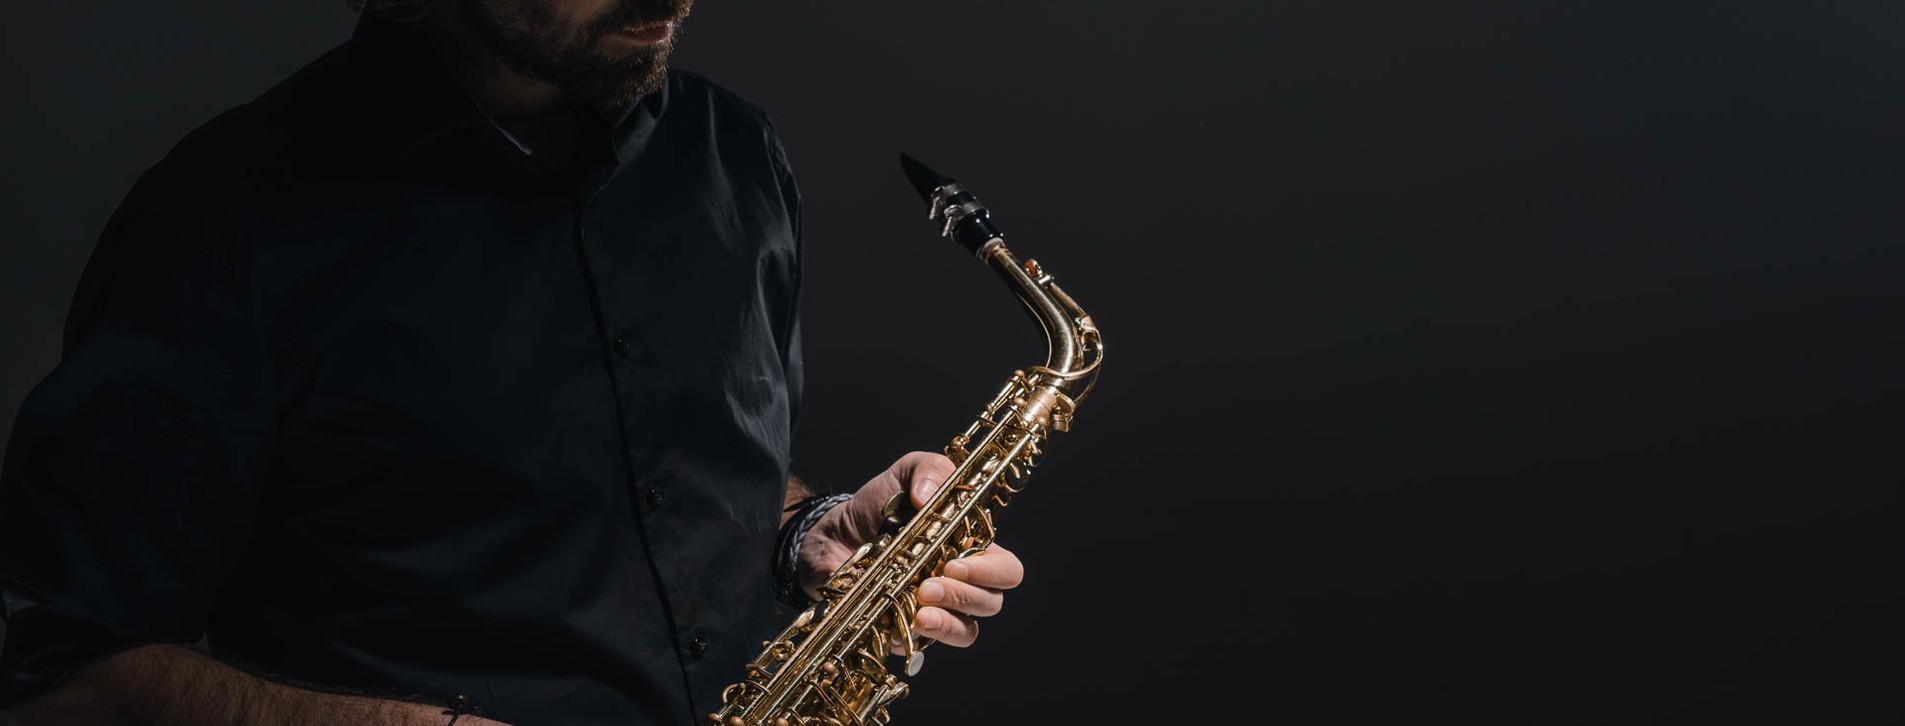 Фото 1 - Мастер-класс игры на саксофоне